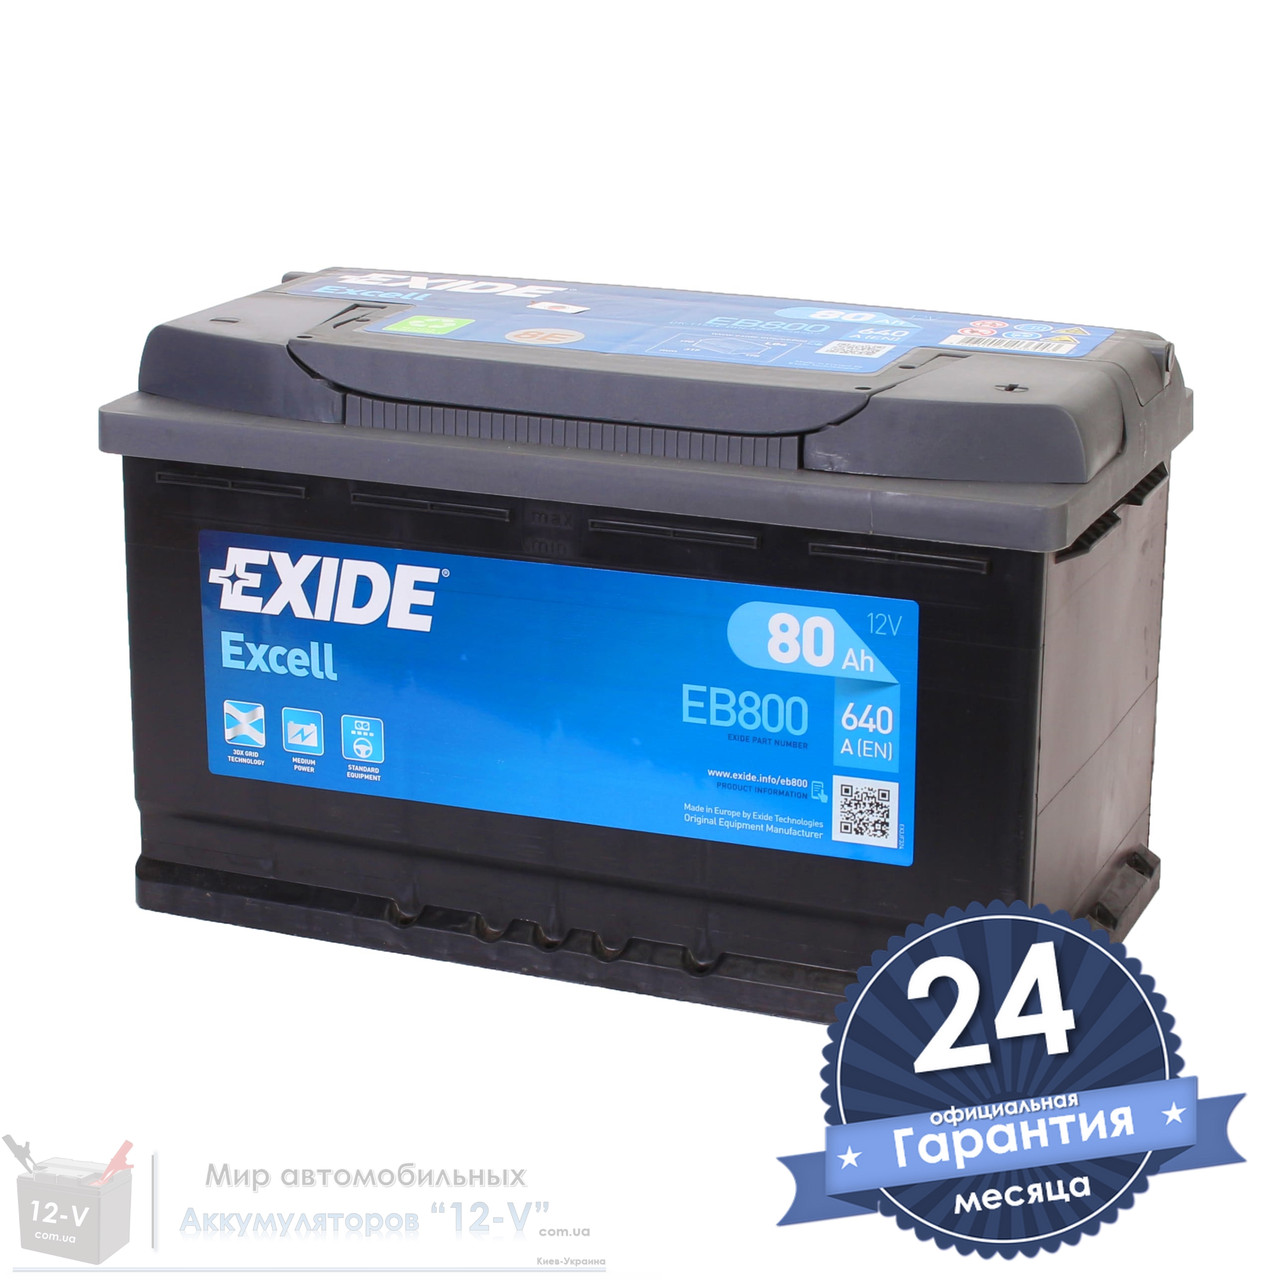 Аккумулятор автомобильный EXIDE Excell 6CT 80Ah, пусковой ток 640А [–|+] (EB800)